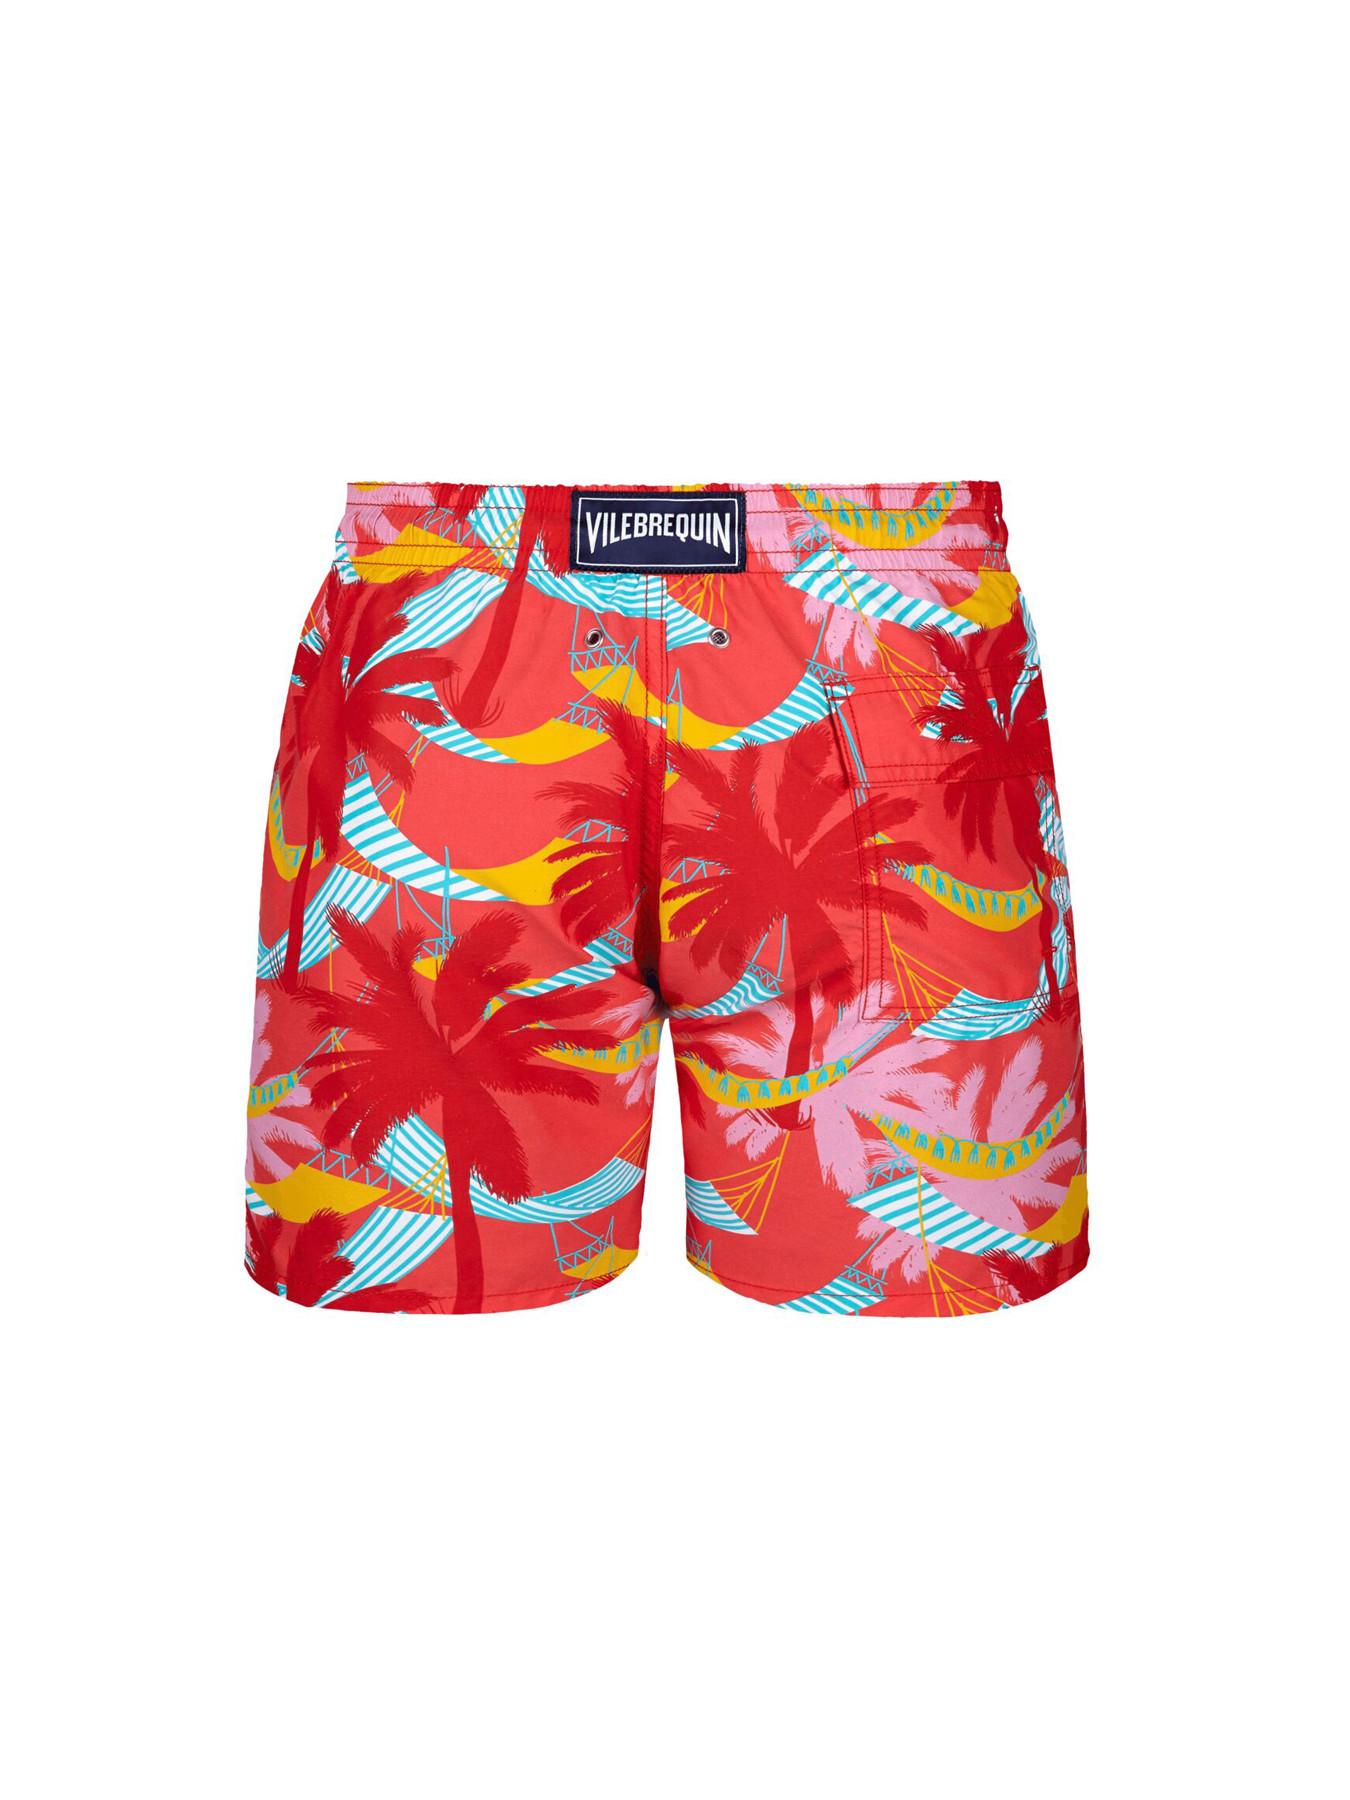 98acf125756dc Vilebrequin Moorea Hammock Print Swim Shorts | Trunks | Fenwick